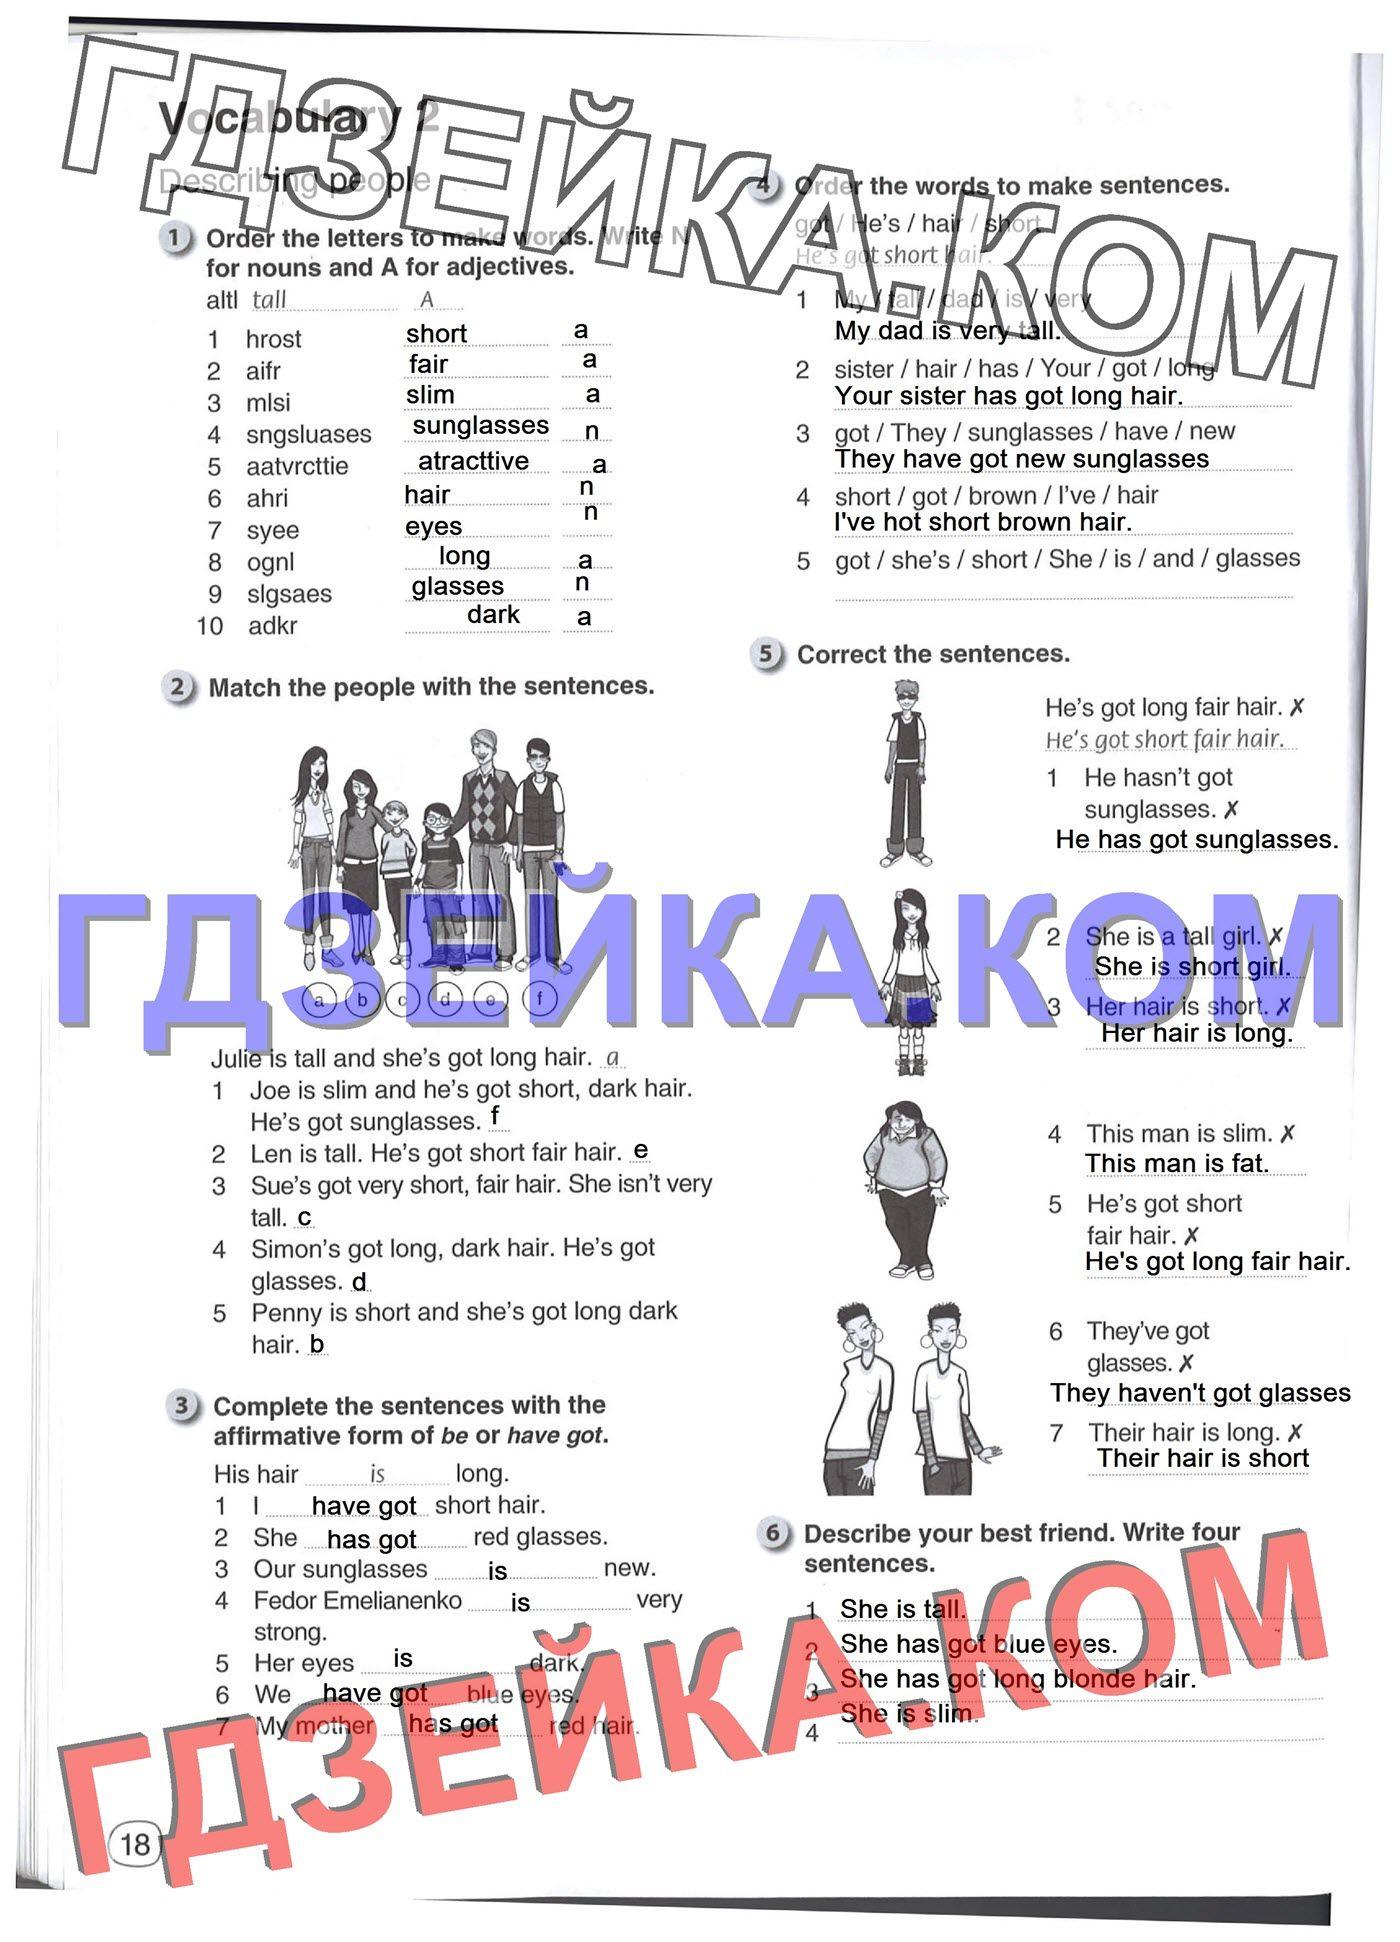 Онлайн решебник по татарскому 10 класс малафеева